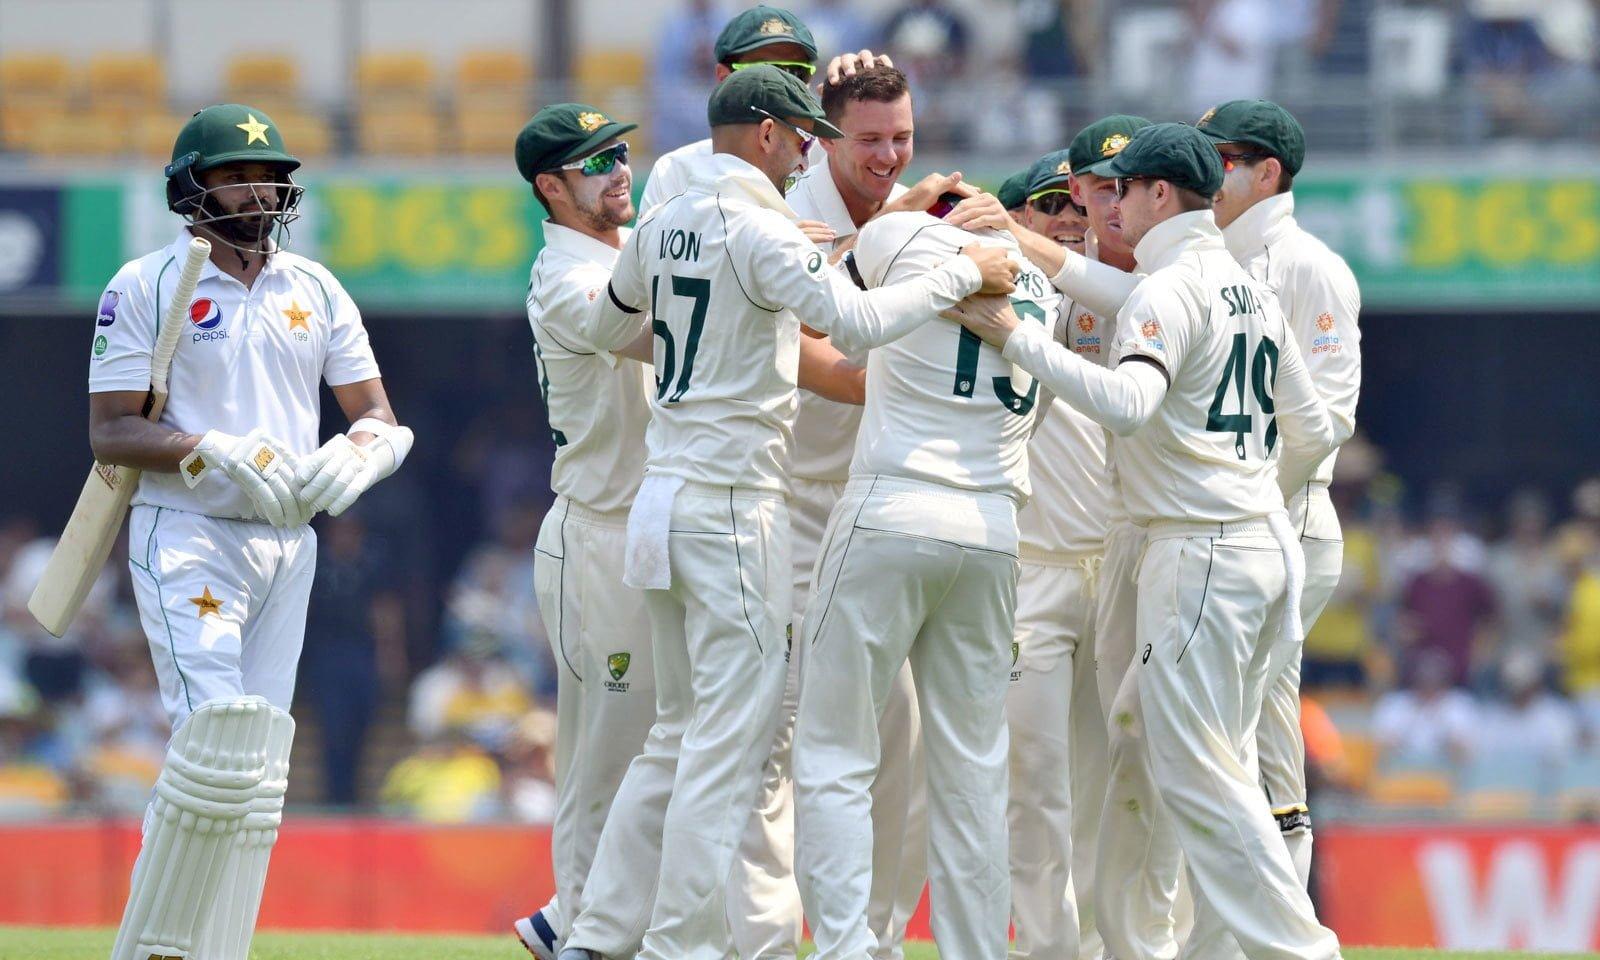 Pictorial view of Australia vs Pakistan Match